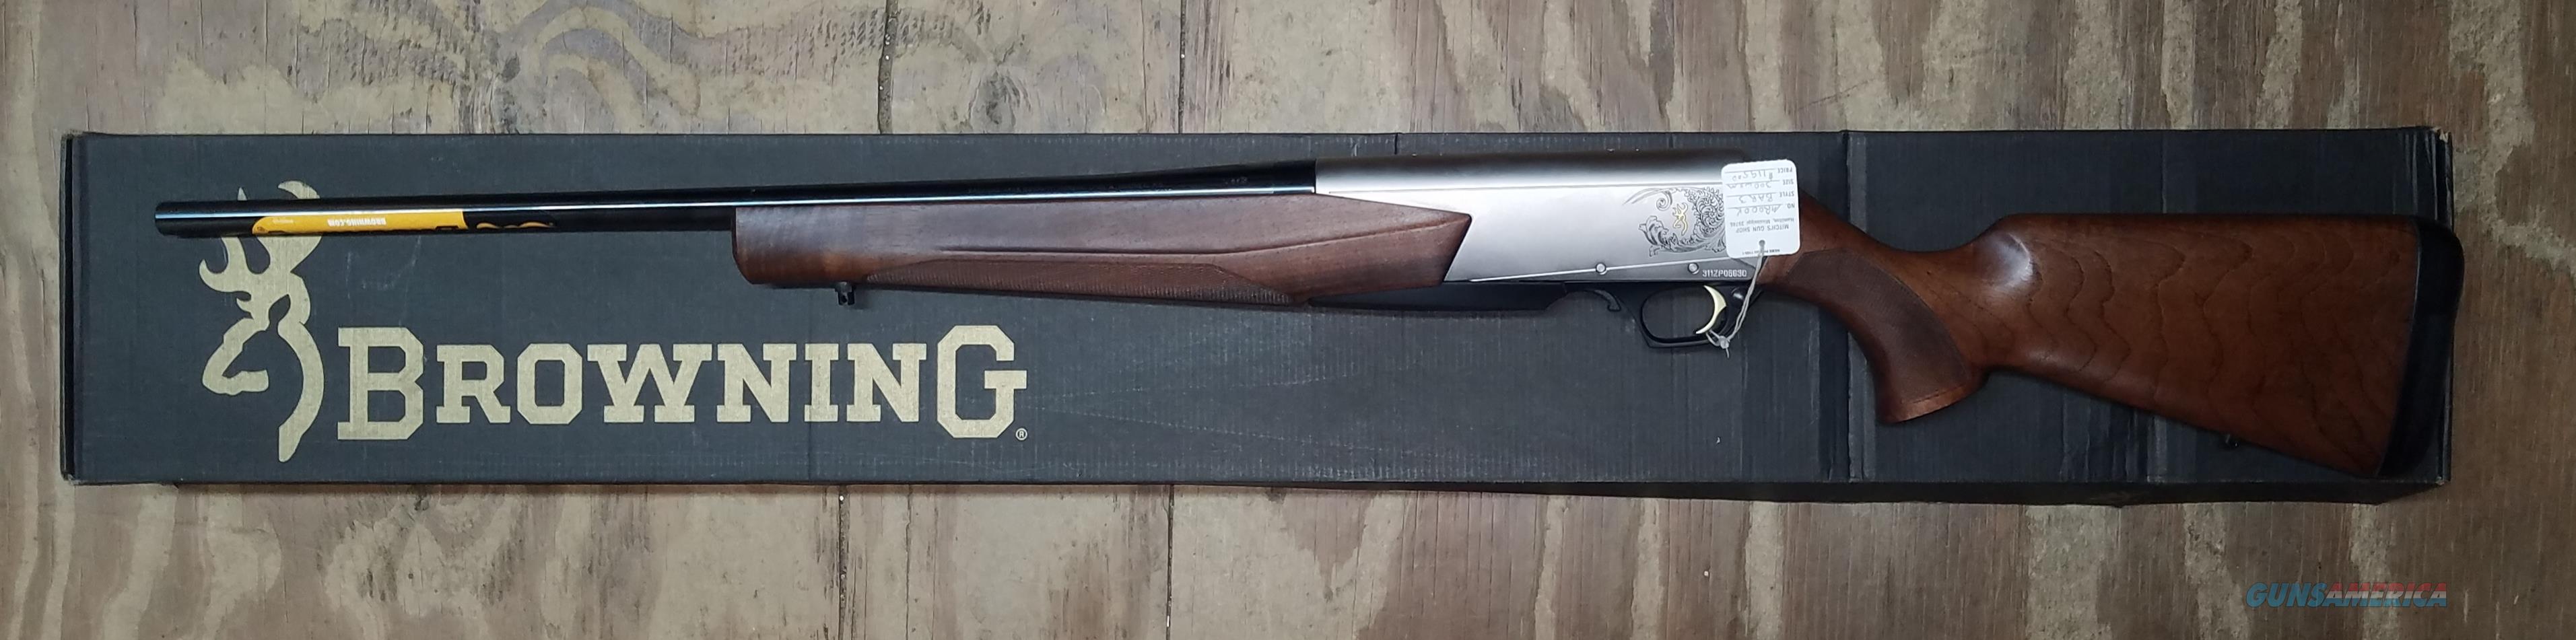 Browning 300 Bar Mark 3 WSM Semi-Auto Rifle 031047246  Guns > Rifles > Browning Rifles > Semi Auto > Hunting